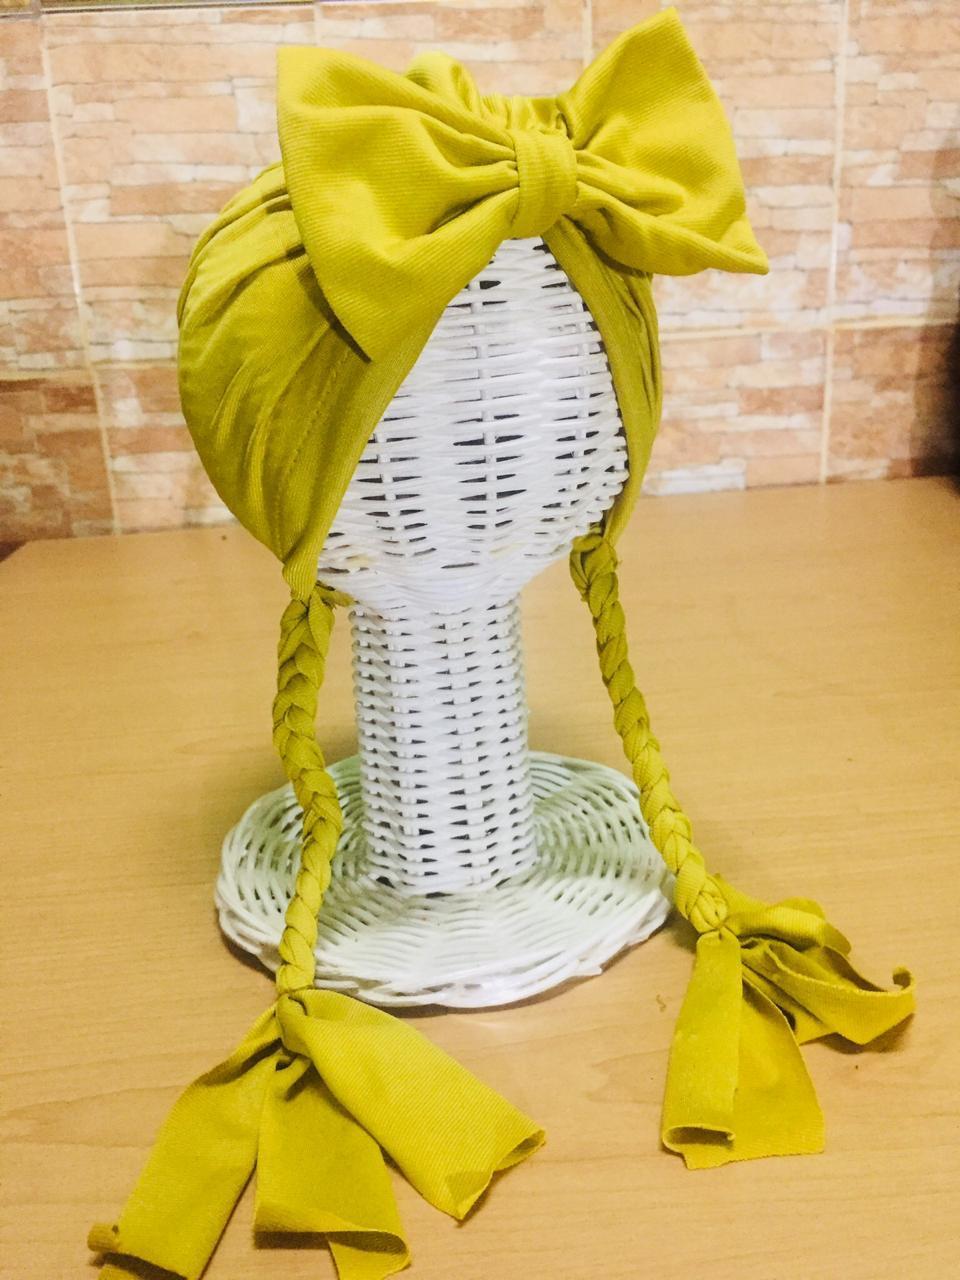 HNFSTORE - TURBAN FROZEN KEPANG Topi Anak Aksesoris Kepala Rambut Baby Bayi 2217f2bd16